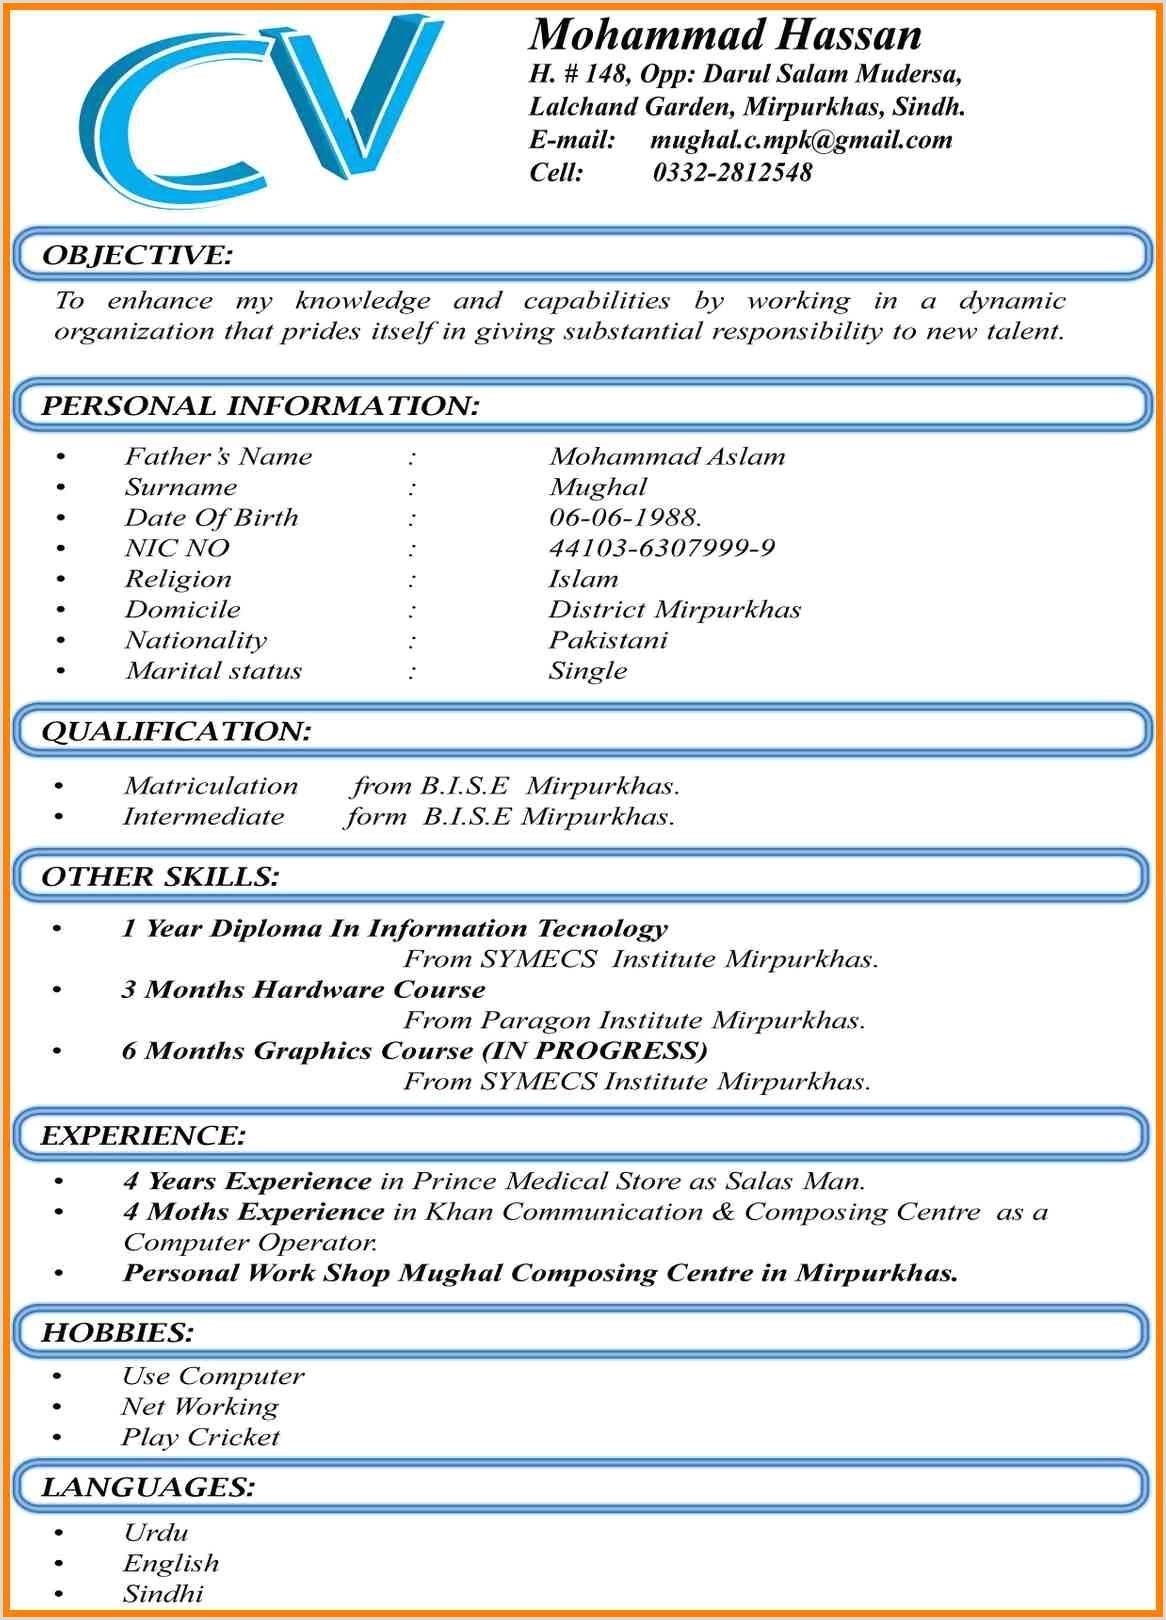 Cv format for Computer Job Cv Word Document format Sandeep